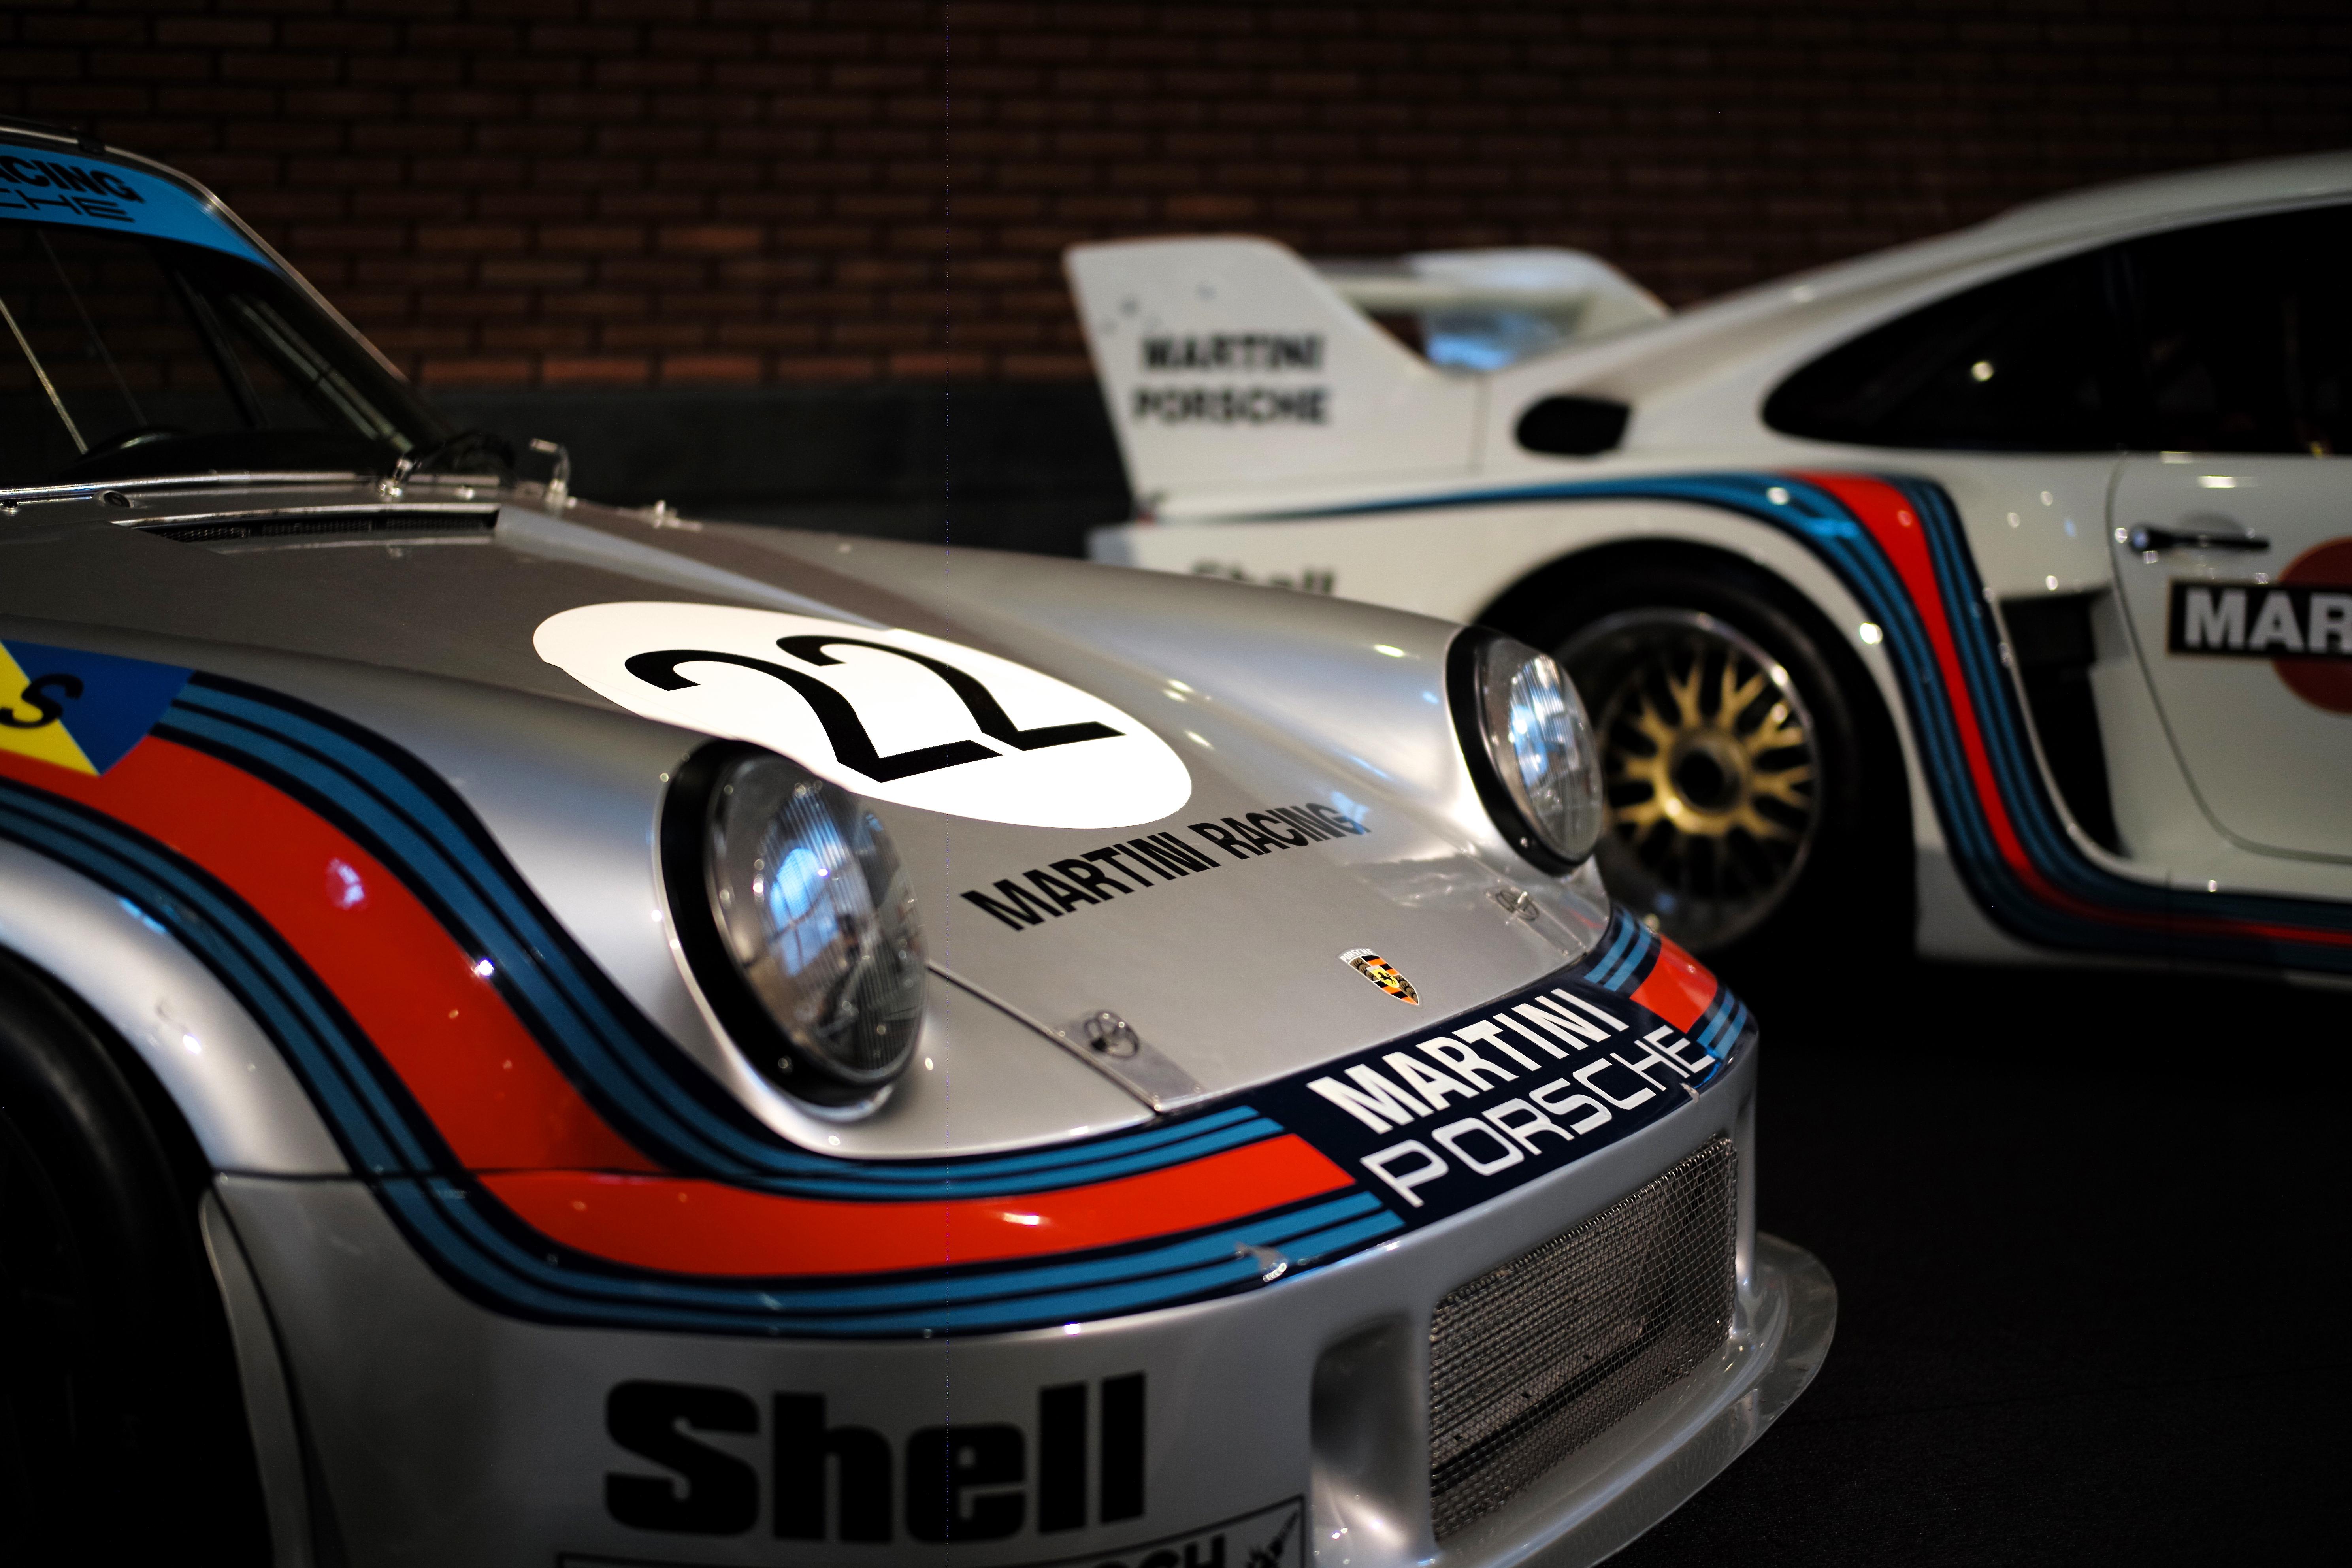 Super Free Images : wheel, museum, martini, sports car, supercar KR-45